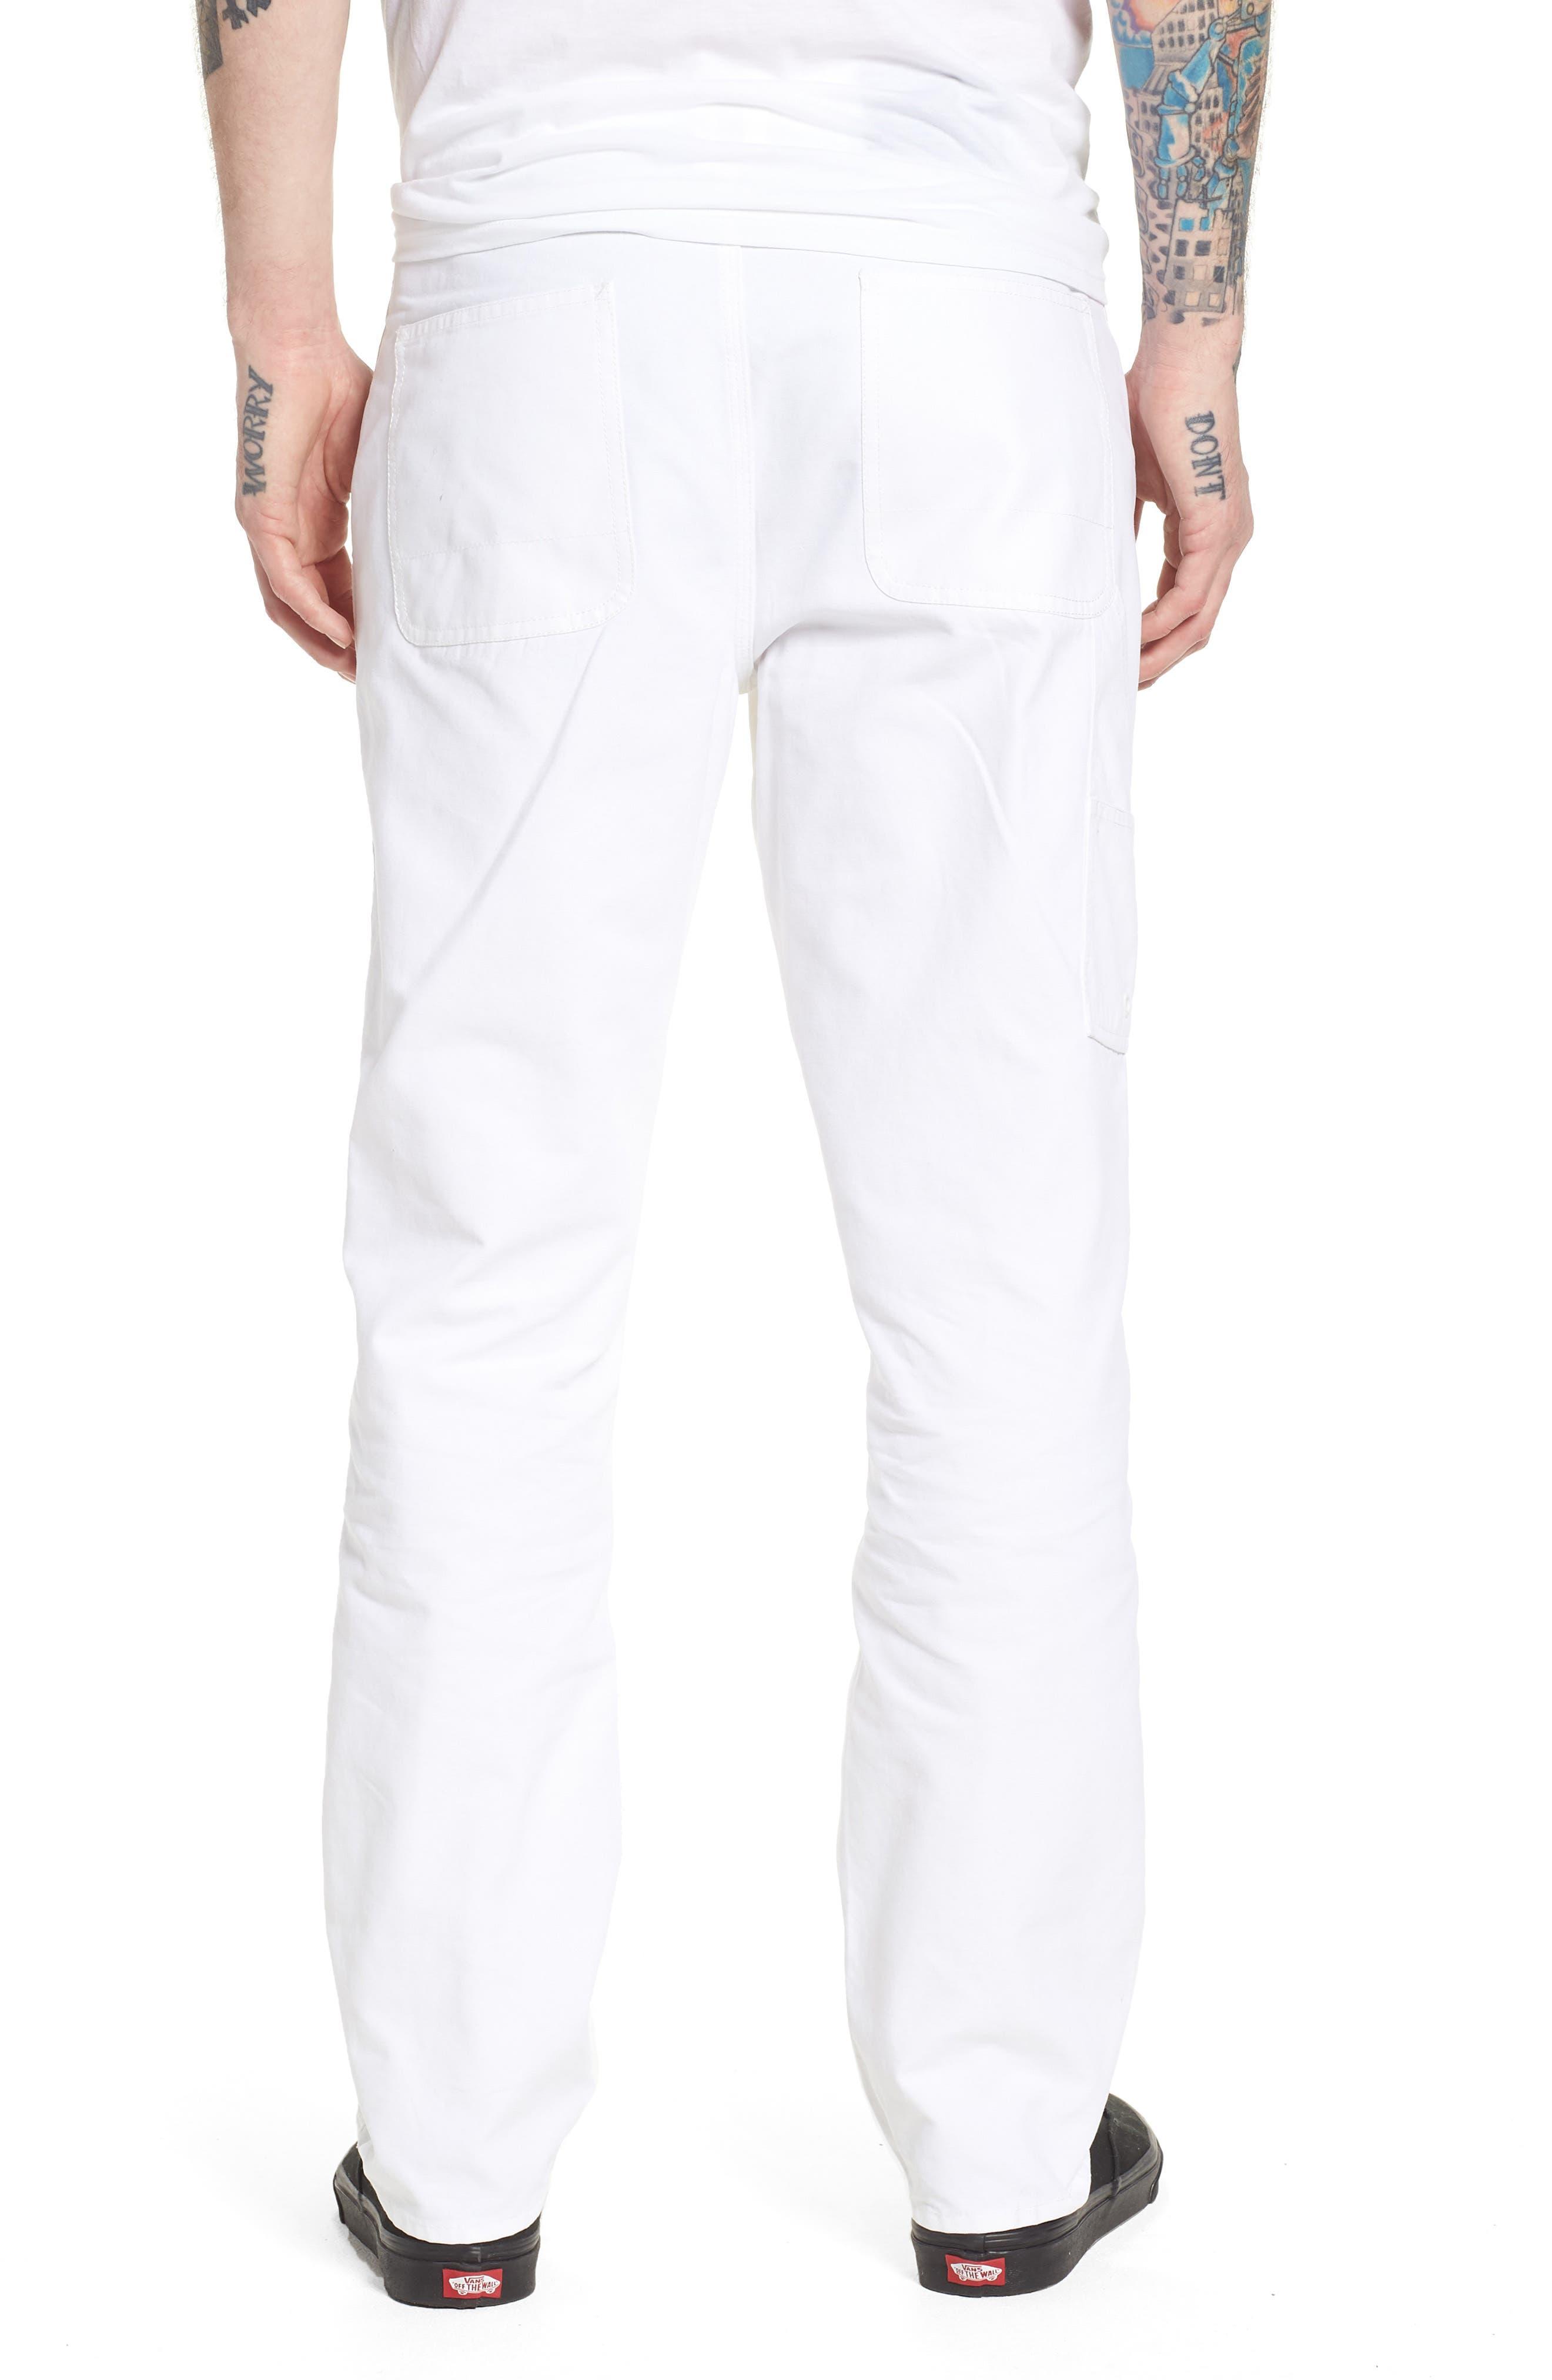 Westport Utility Pants,                             Alternate thumbnail 2, color,                             White